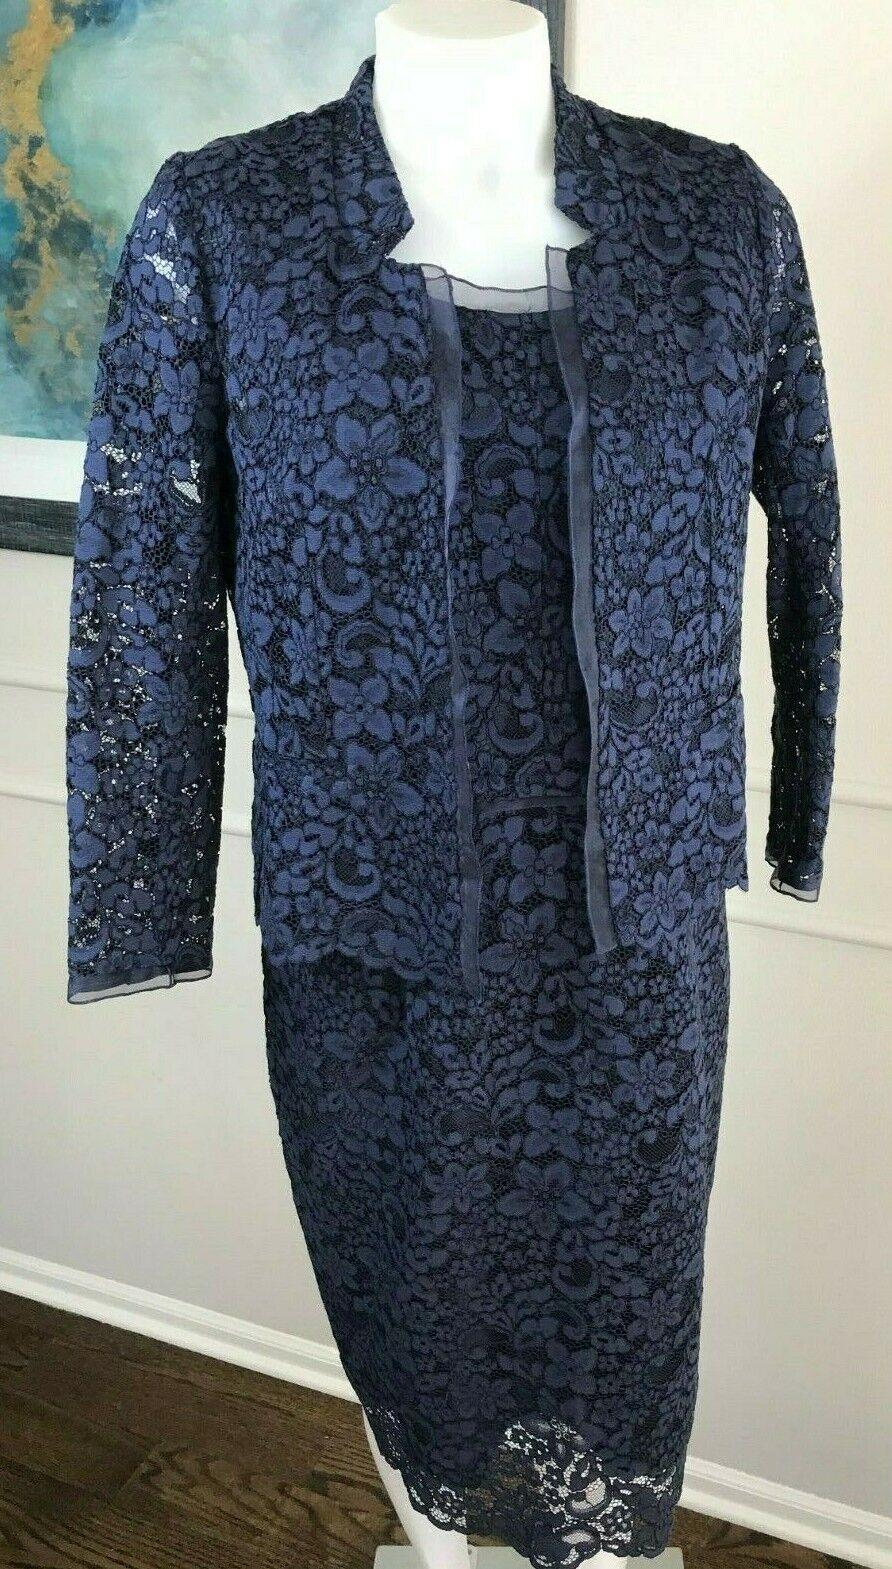 Gerard Darel Woman's 2 PC Dress Jacket Lace Navy Blau    Sz 38 42  BEAUTIFUL